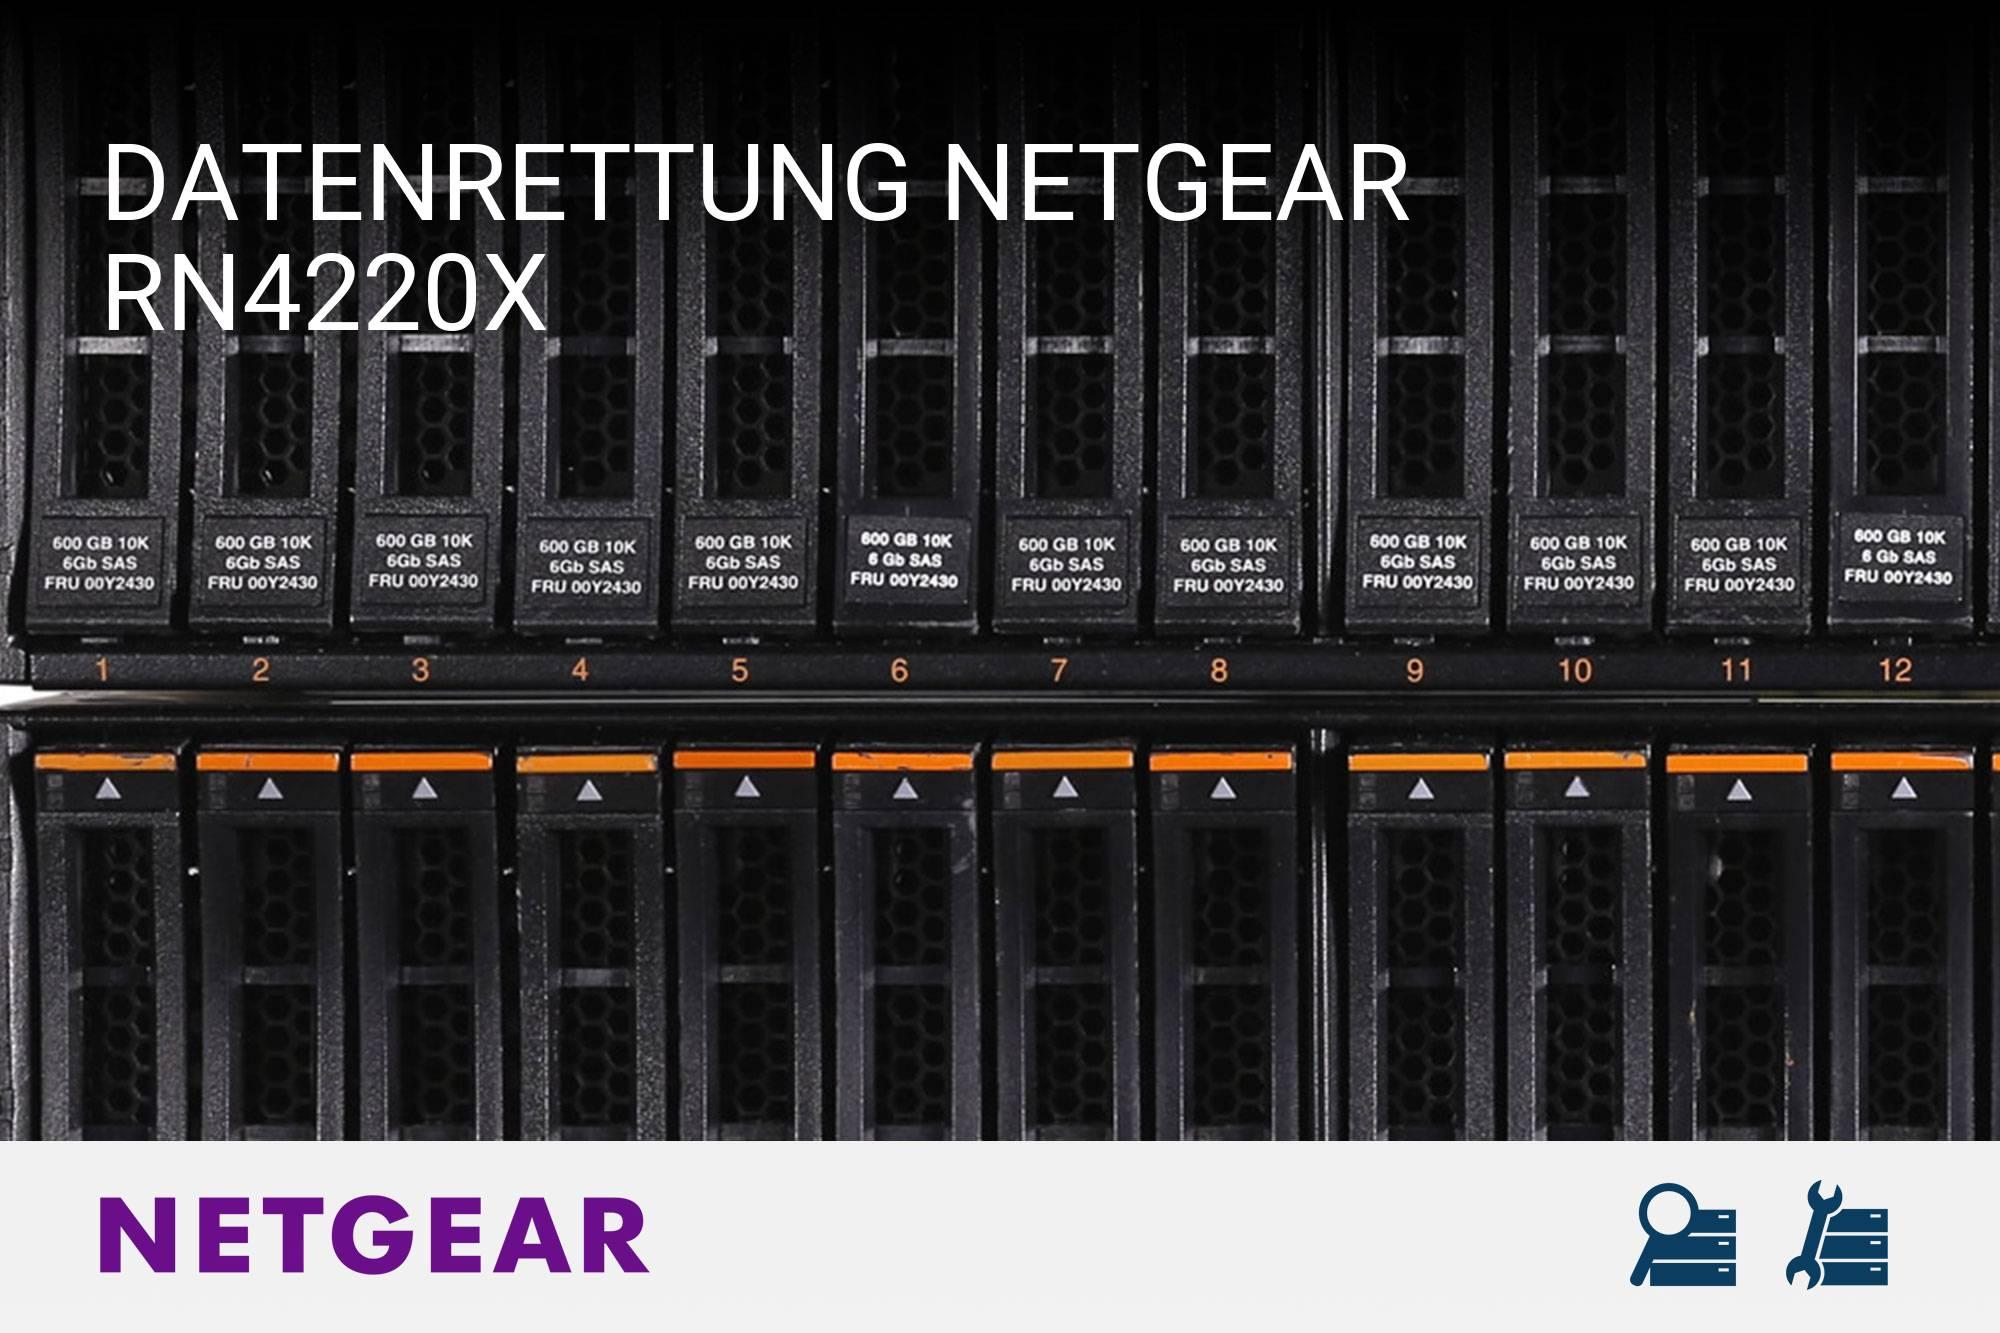 Netgear RN4220X